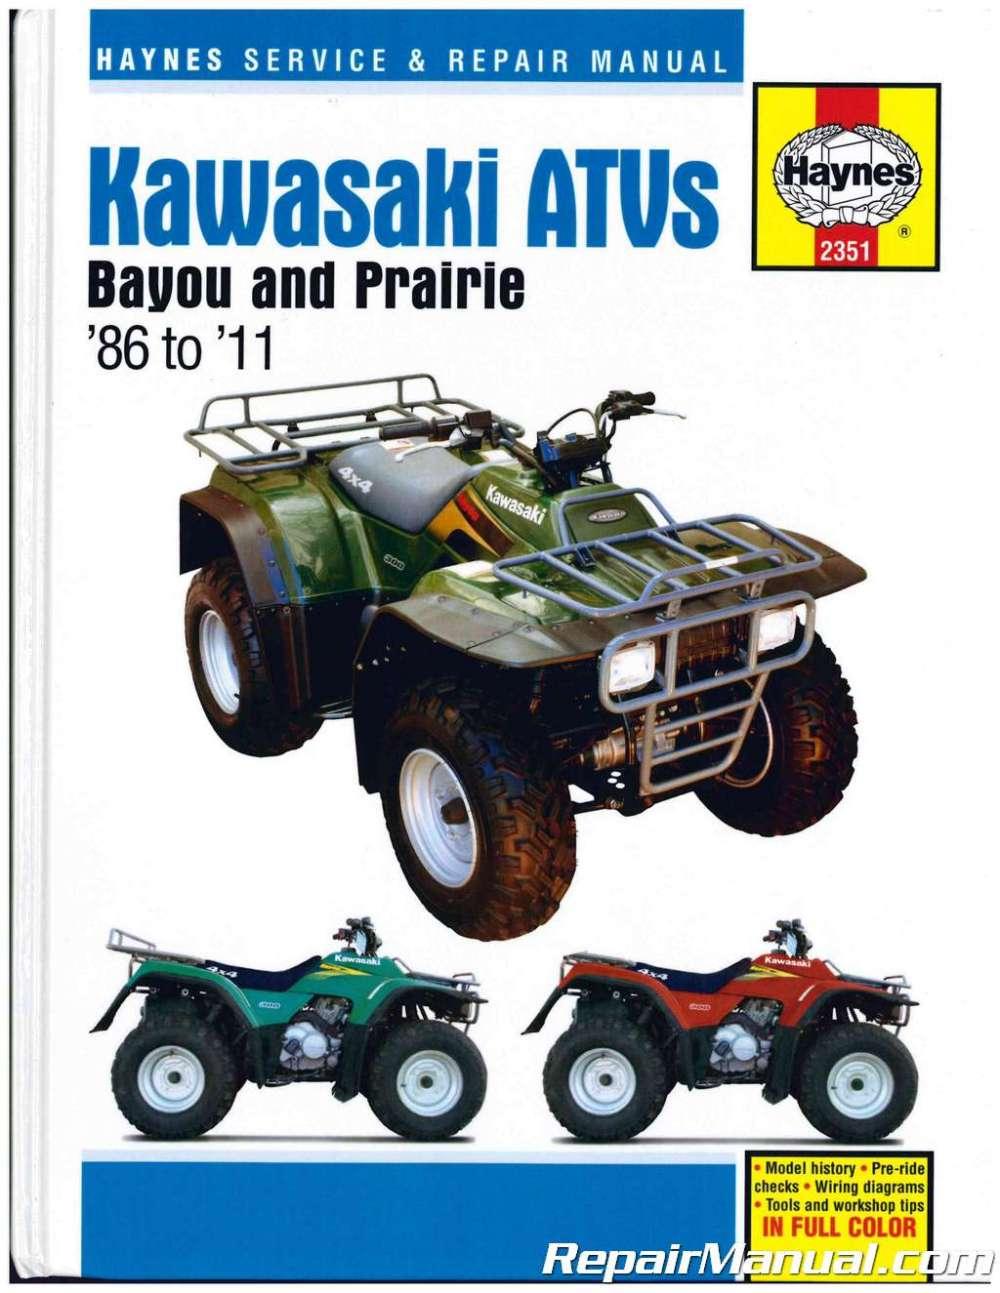 medium resolution of 1997 kawasaki prairie 400 4x4 repair manual